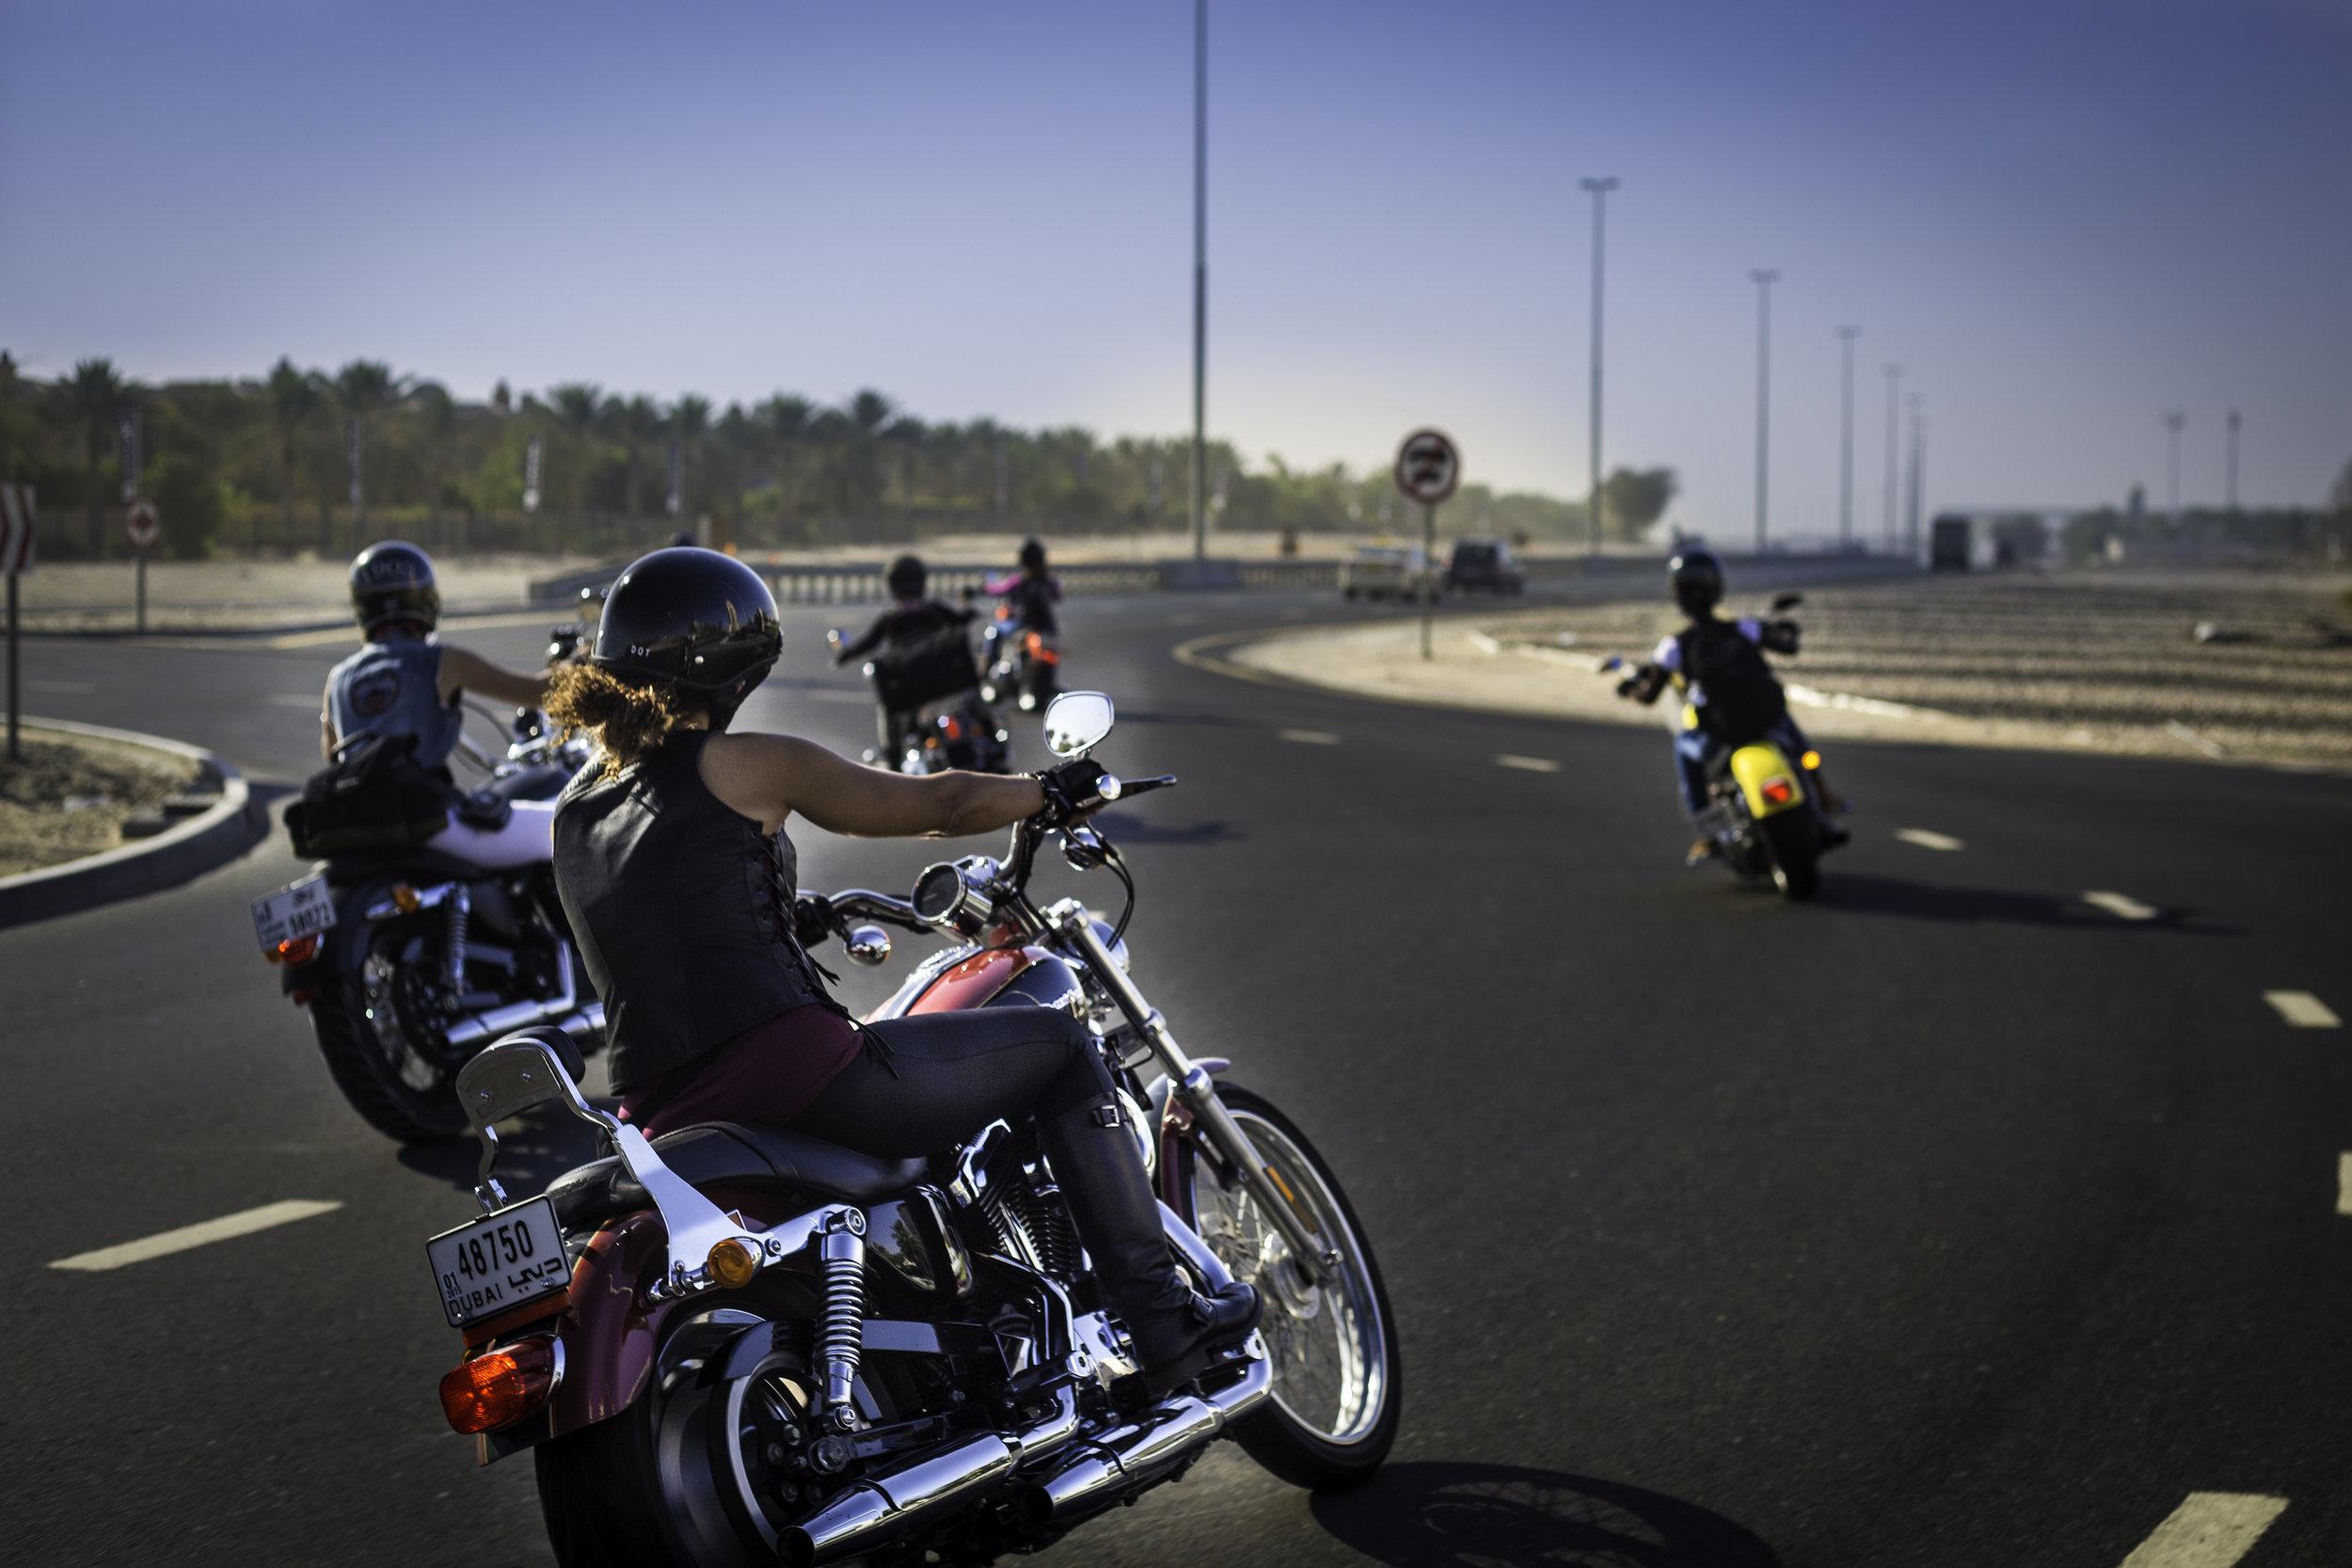 Dubai Ladies of Harley riders riding back to Dubai after marking International Female Ride Day (3).jpg